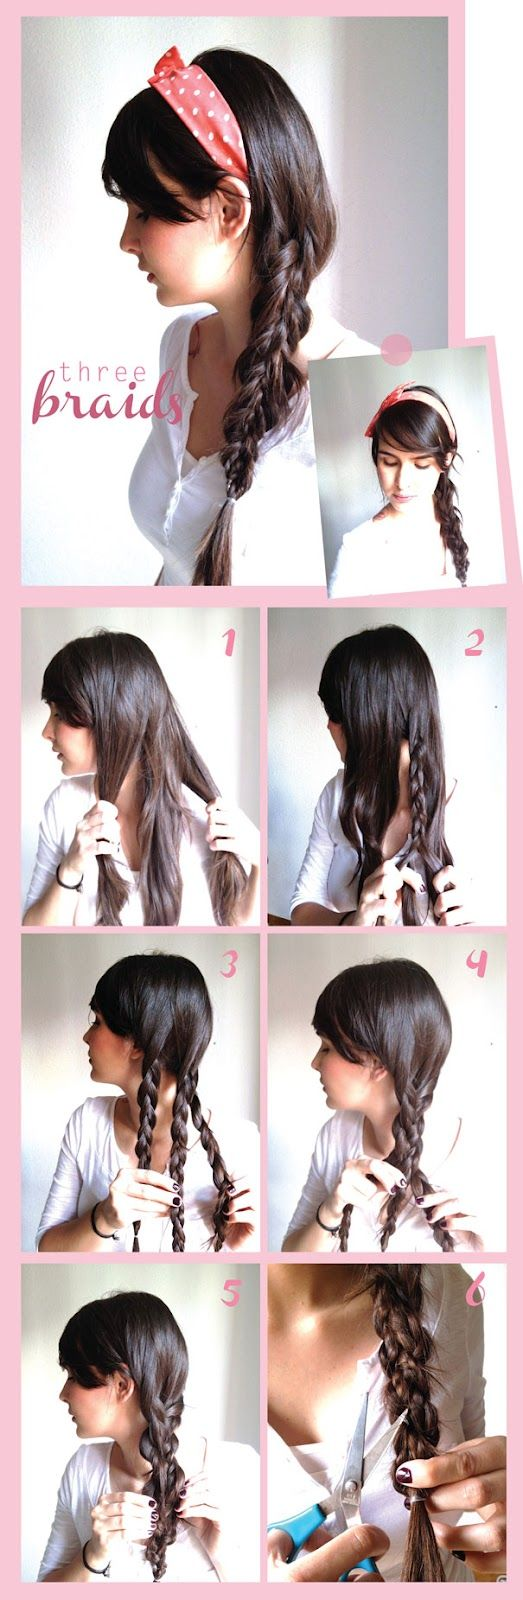 Three braids